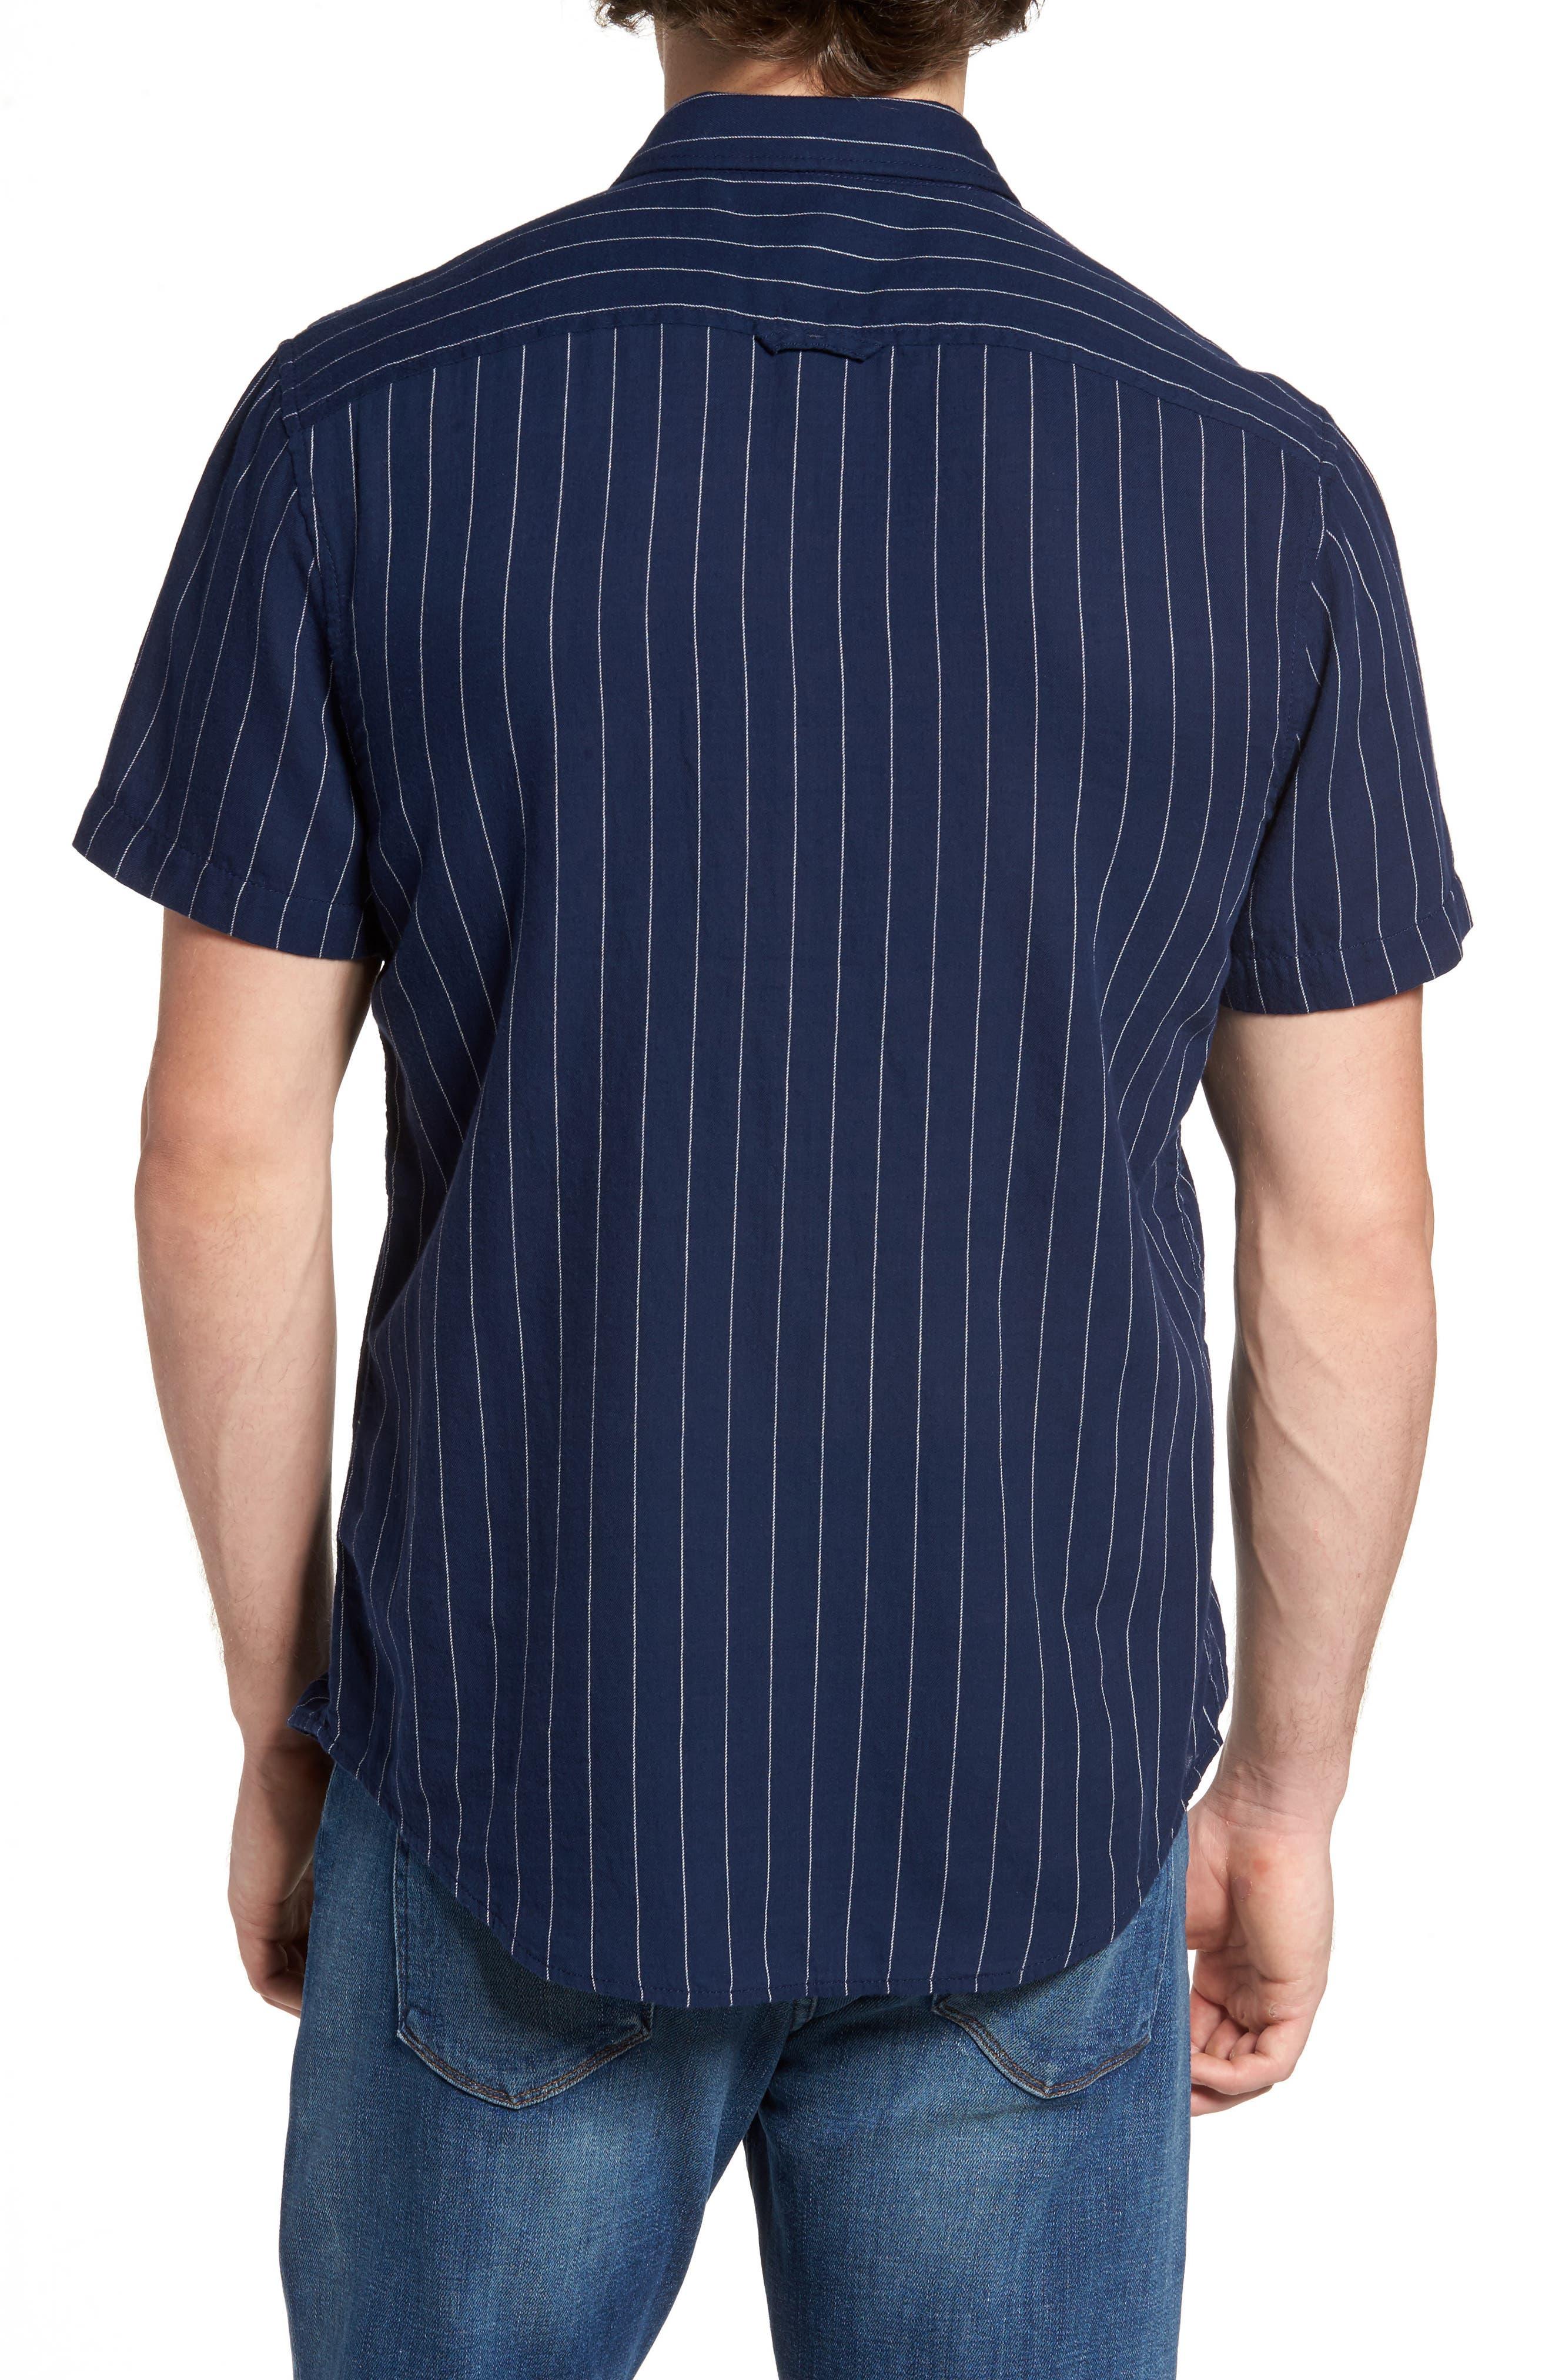 Stripe Twill Shirt,                             Alternate thumbnail 2, color,                             410